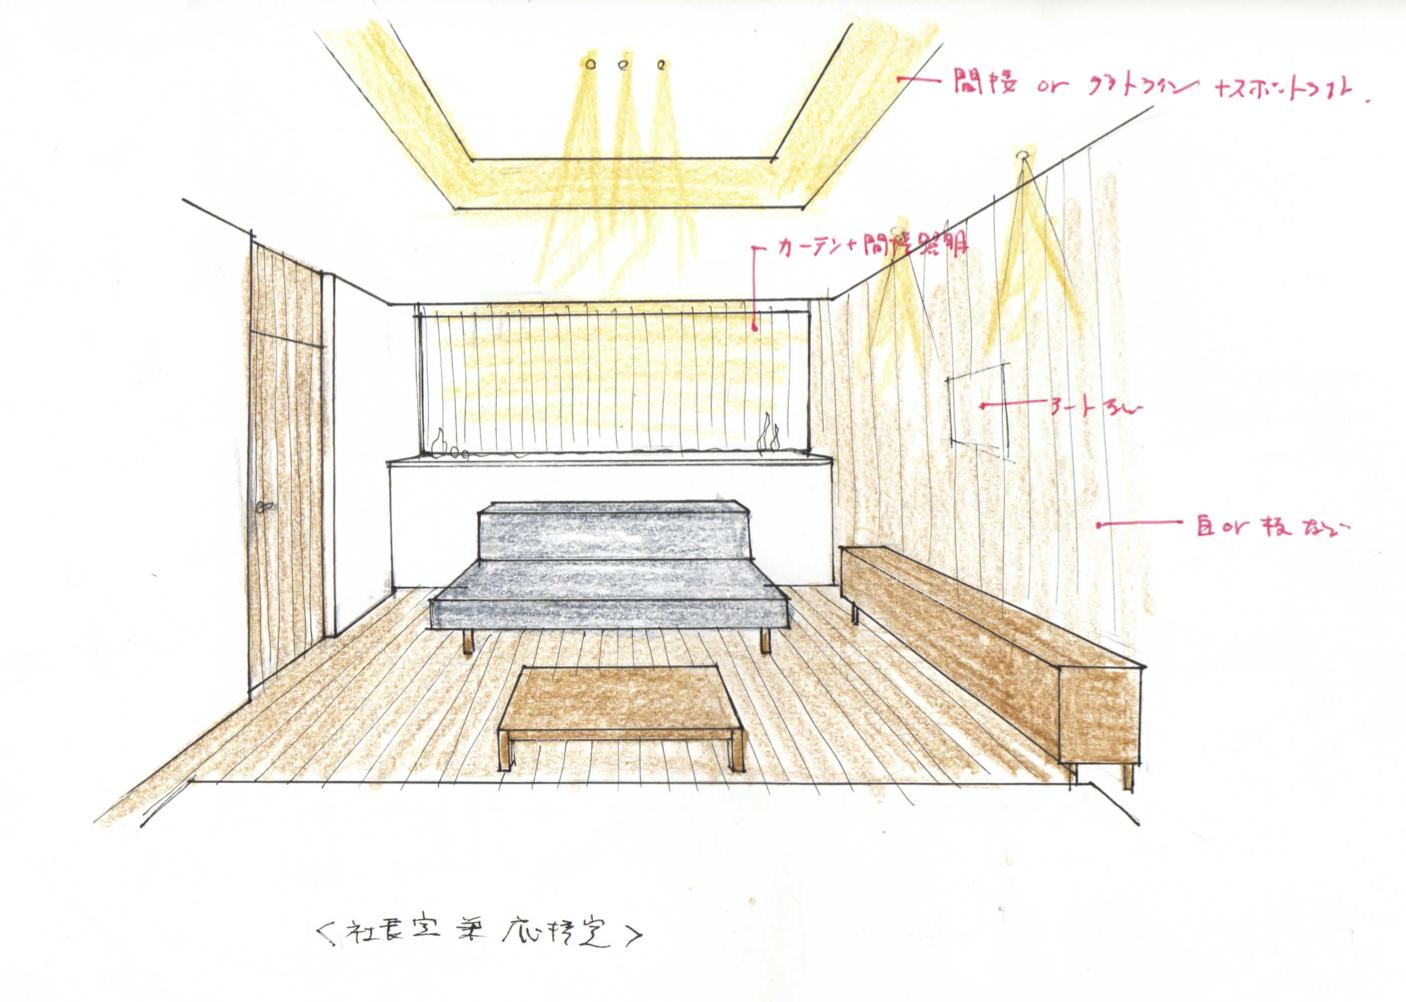 オフィス設計,大阪,京都,神戸,デザイン,建築家,設計事務所